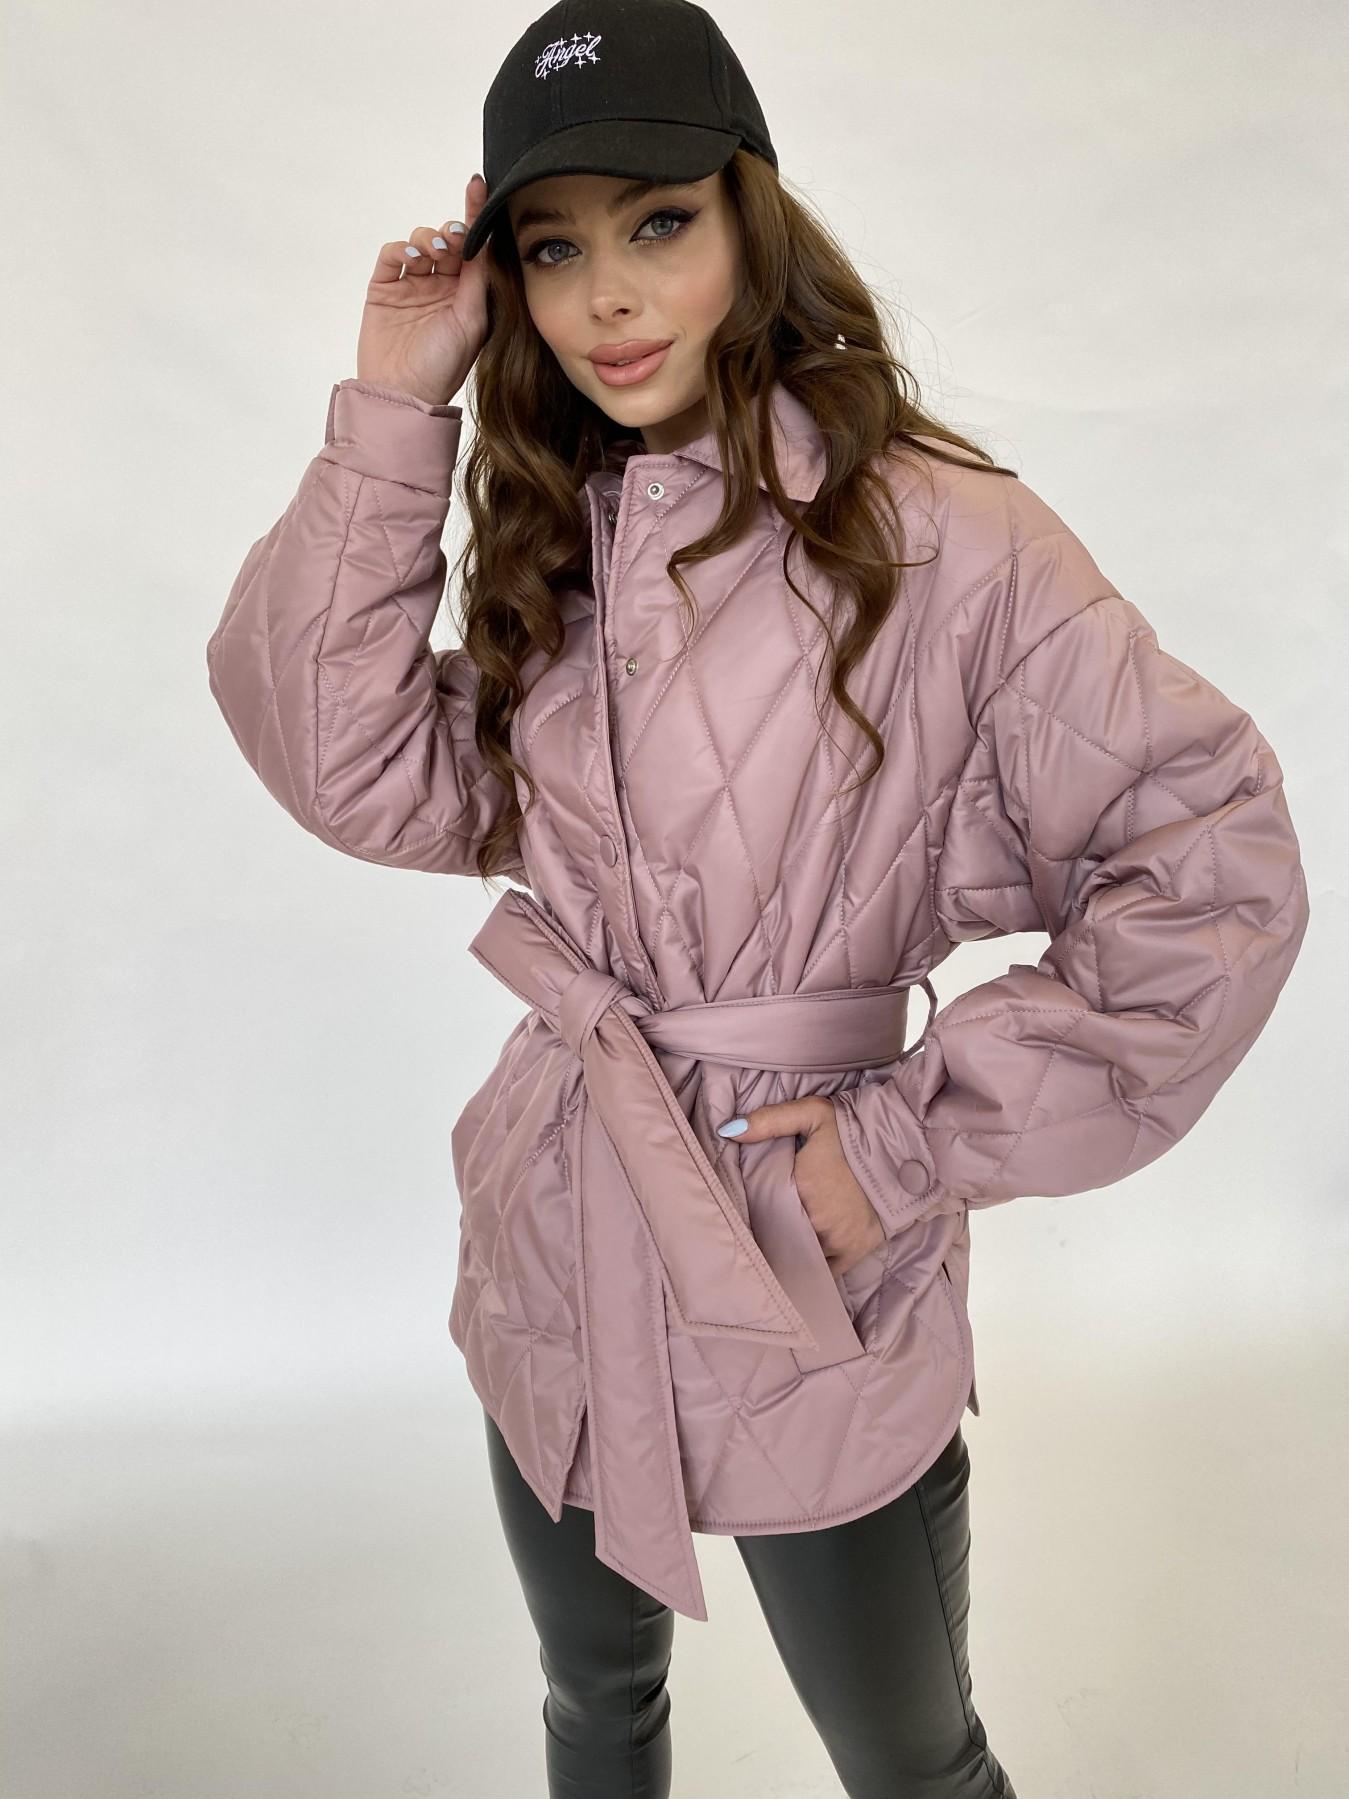 Моно  куртка из плащевой ткани Gloria 11081 АРТ. 47647 Цвет: Пудра - фото 5, интернет магазин tm-modus.ru